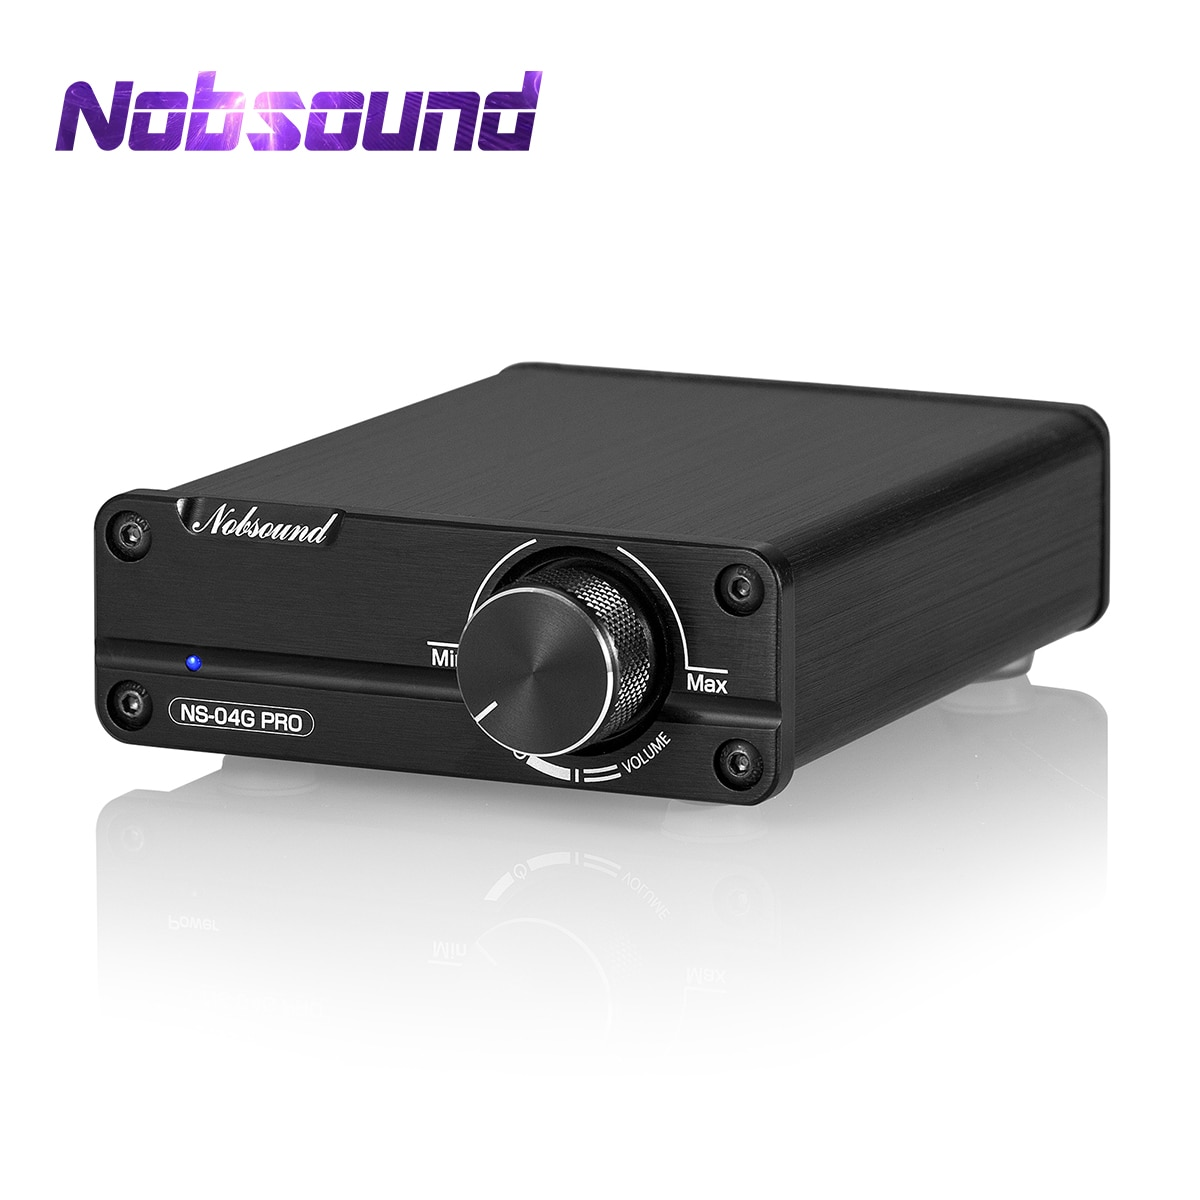 Nobsound-مضخم طاقة رقمي صغير ، مضخم صوت هاي فاي ، ستيريو ، 2.0 قناة ، فئة D ، صوت سطح المكتب المنزلي ، 50 واط ، 50 واط ، 100 واط 100 واط